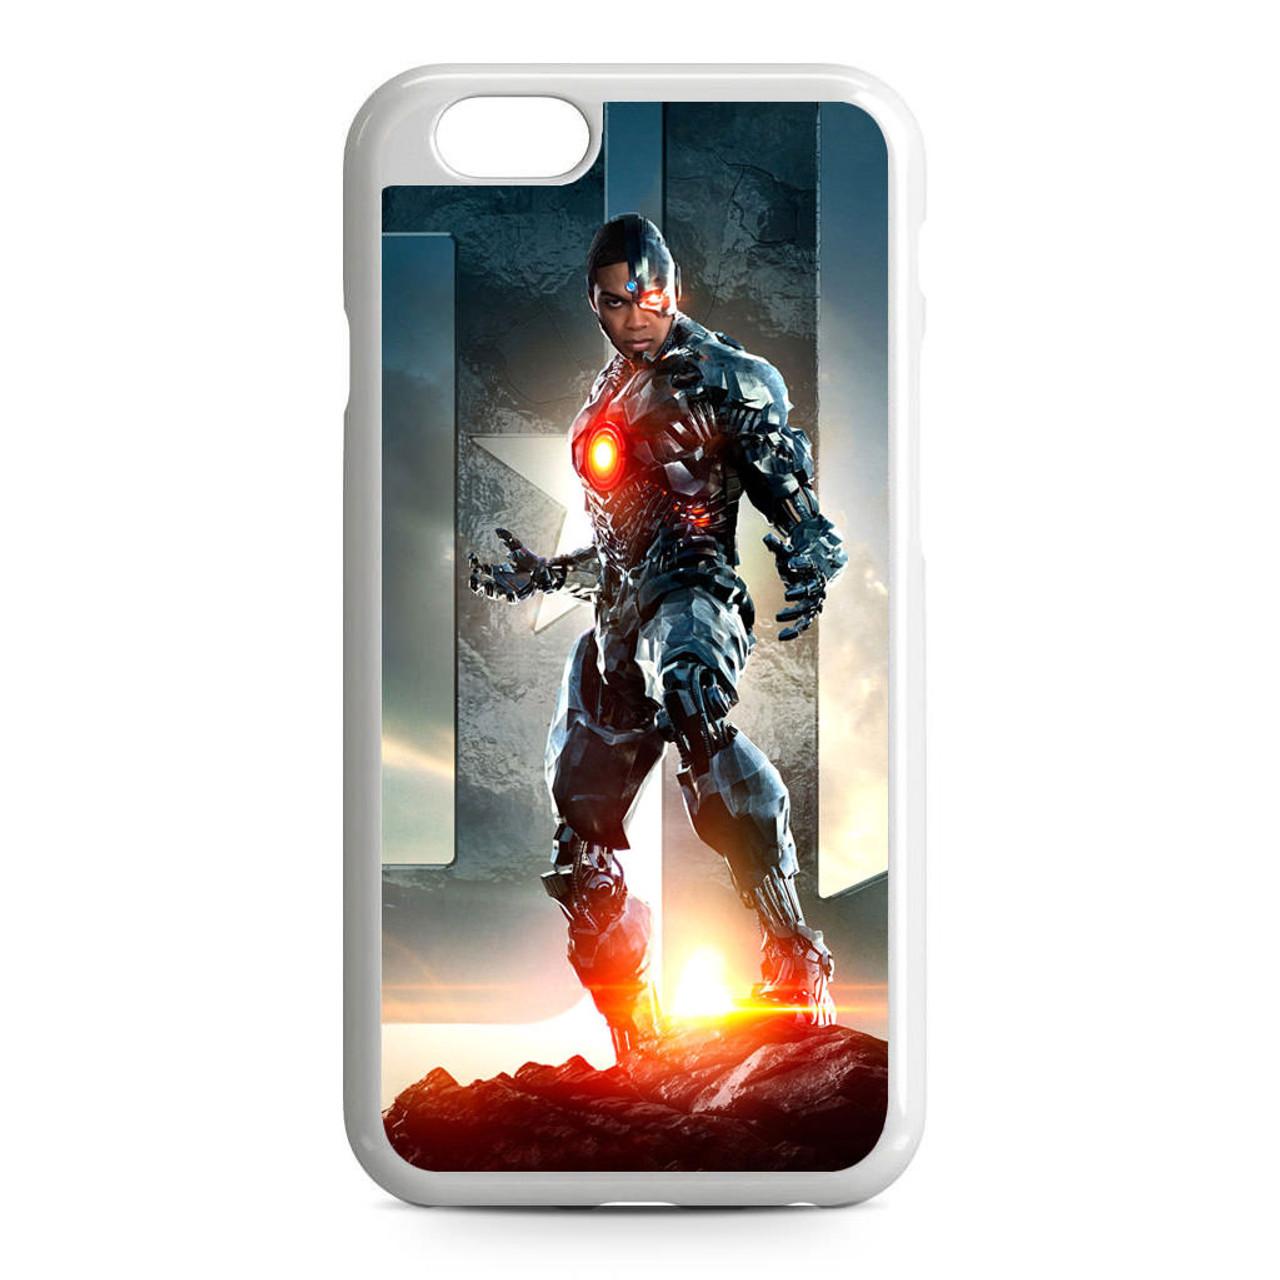 Justice League Unite Cyborg iPhone 6/6S Case